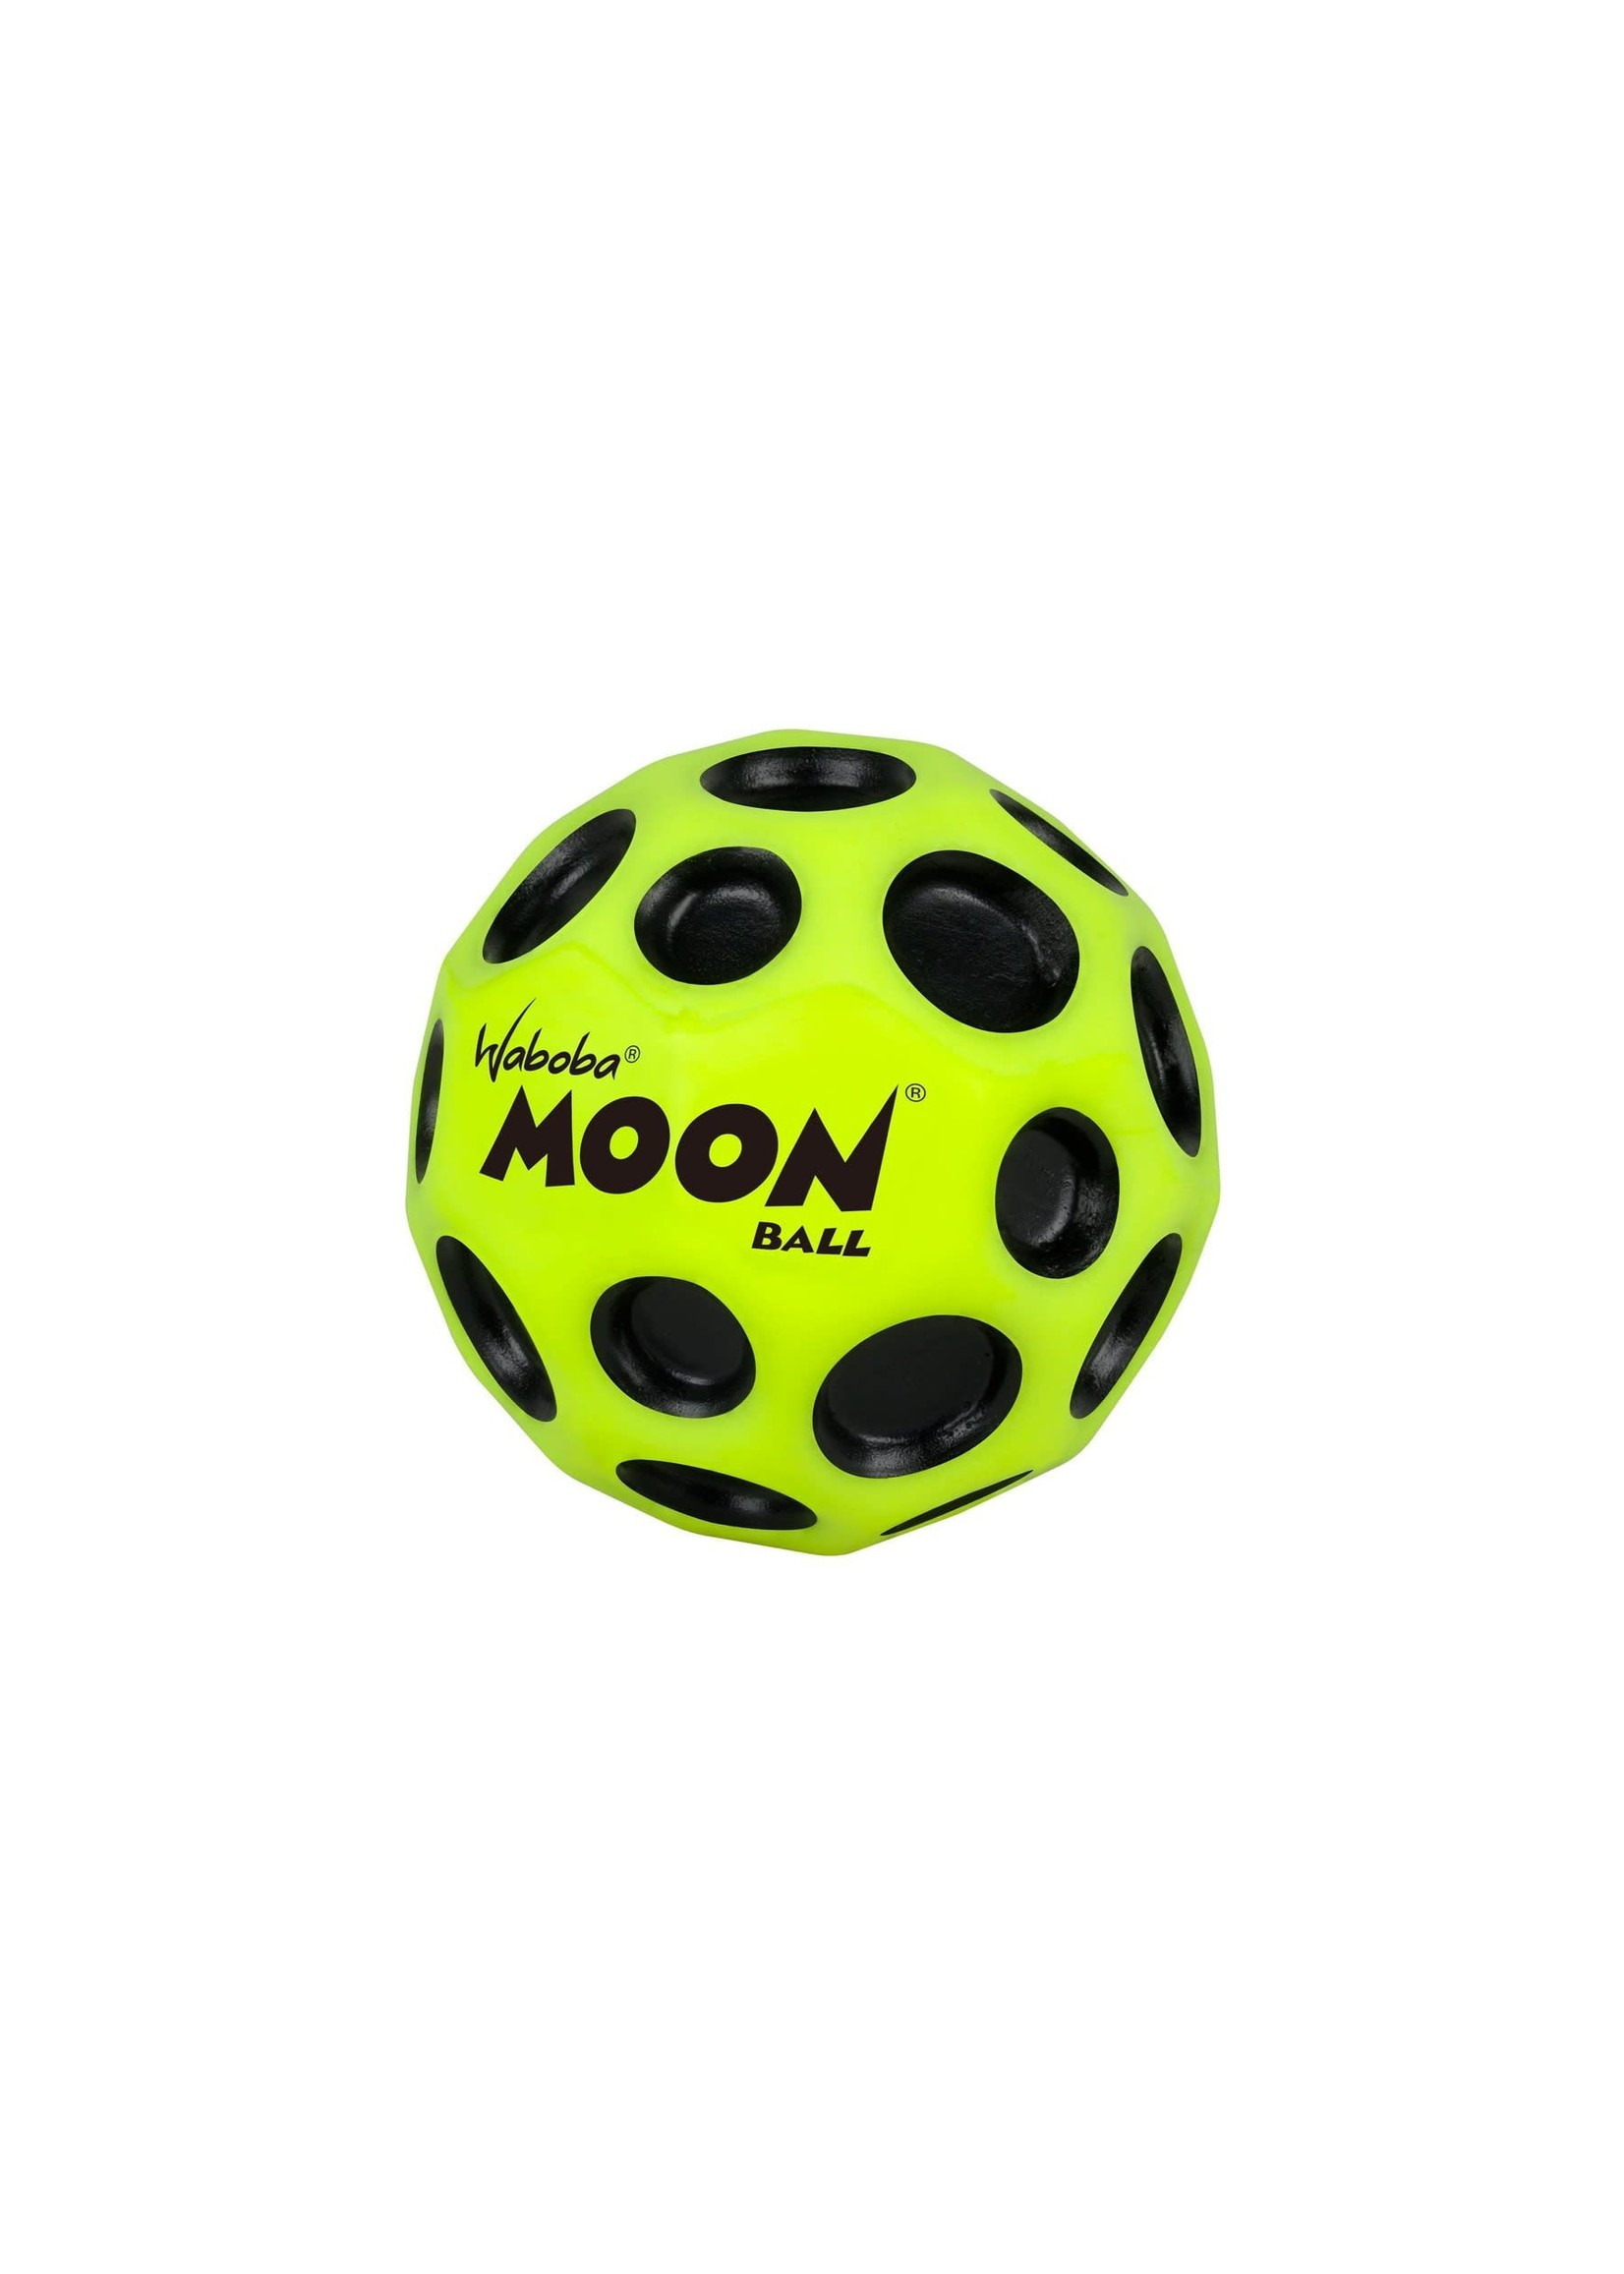 Waboba Moon Ball Hyperbouncing Ball (Yellow)